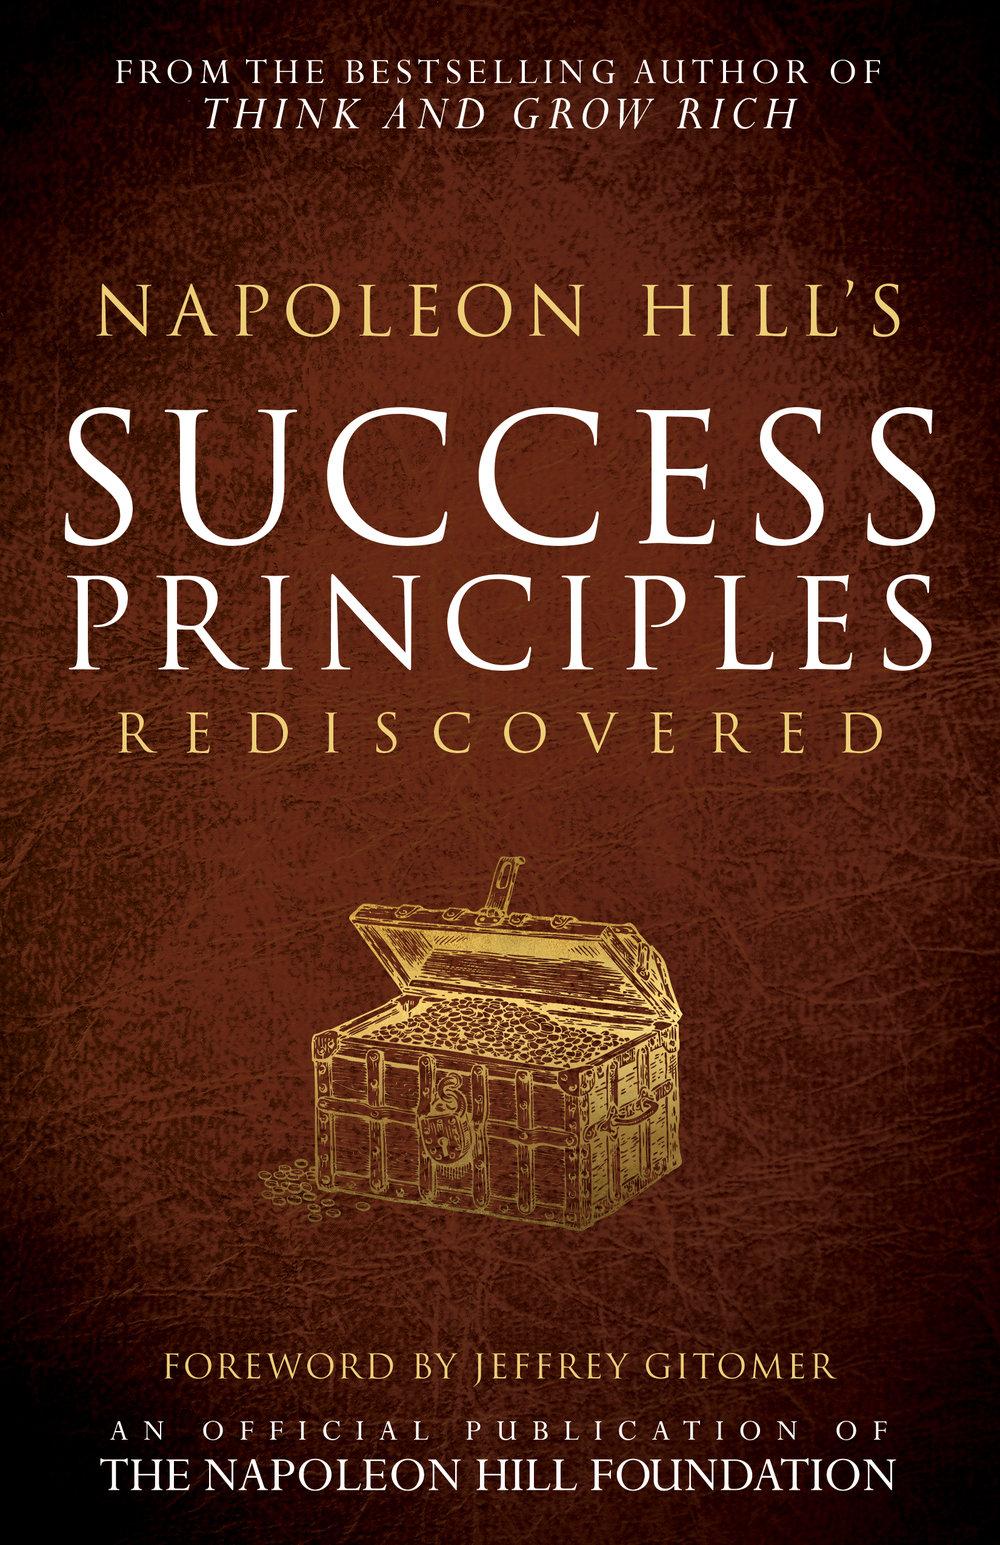 Napoleon_Hill's_Success_Principles_Rediscovered.jpg